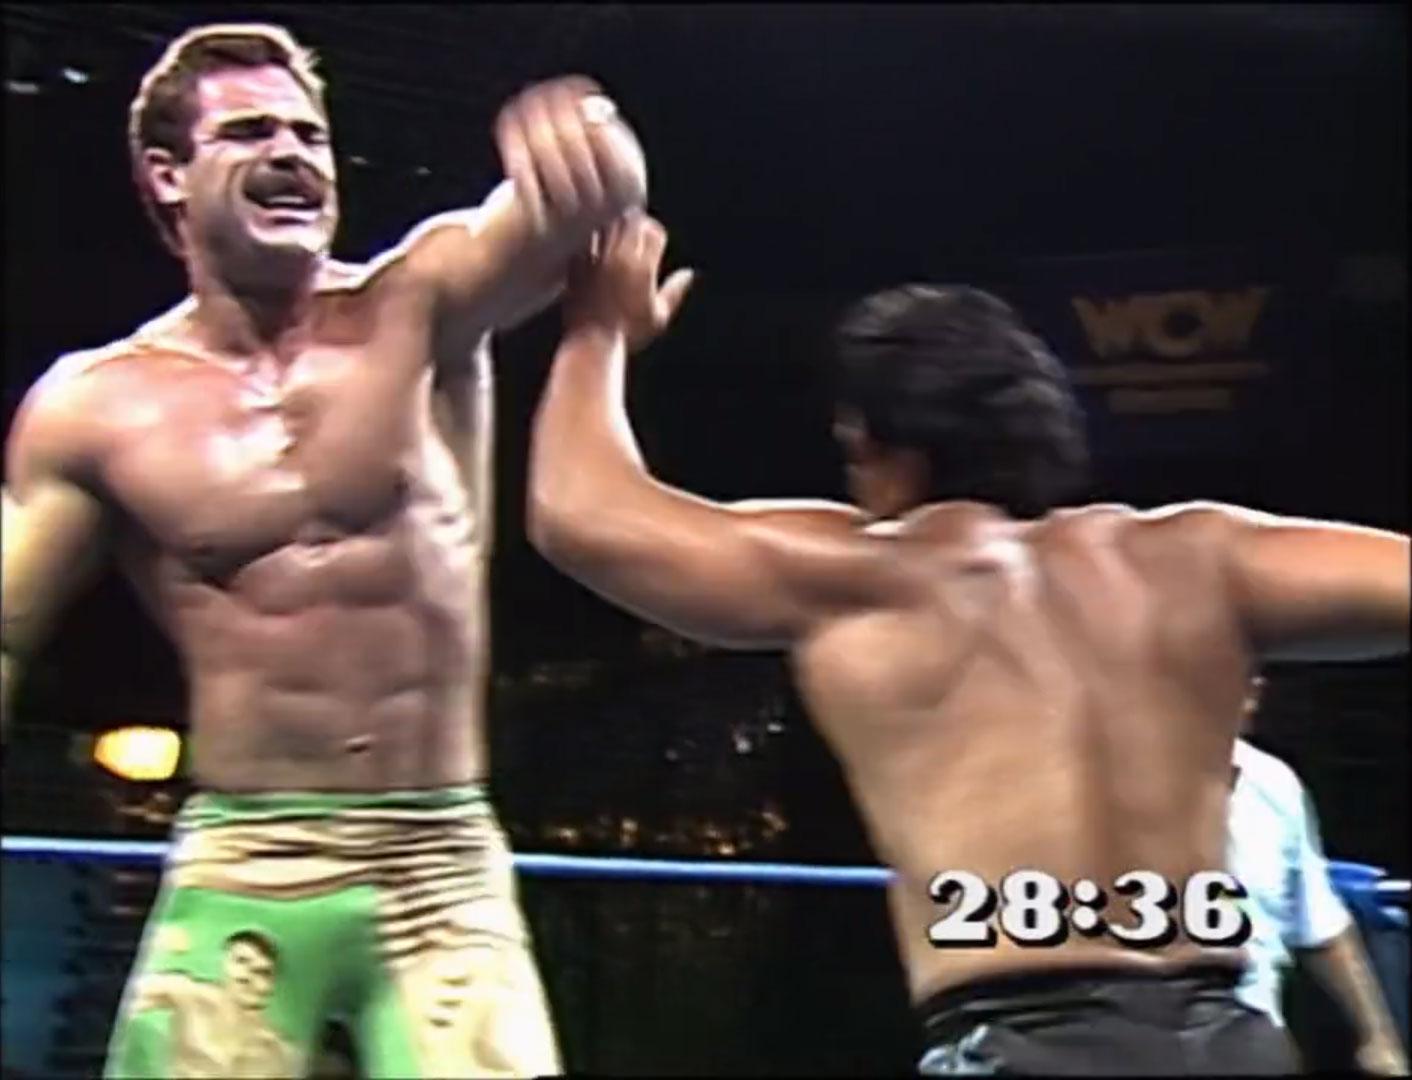 Ricky Steamboat vs. Rick Rude 30 Minute Iron-man Match WCW Beach Blast '92 Jun 20th 1992